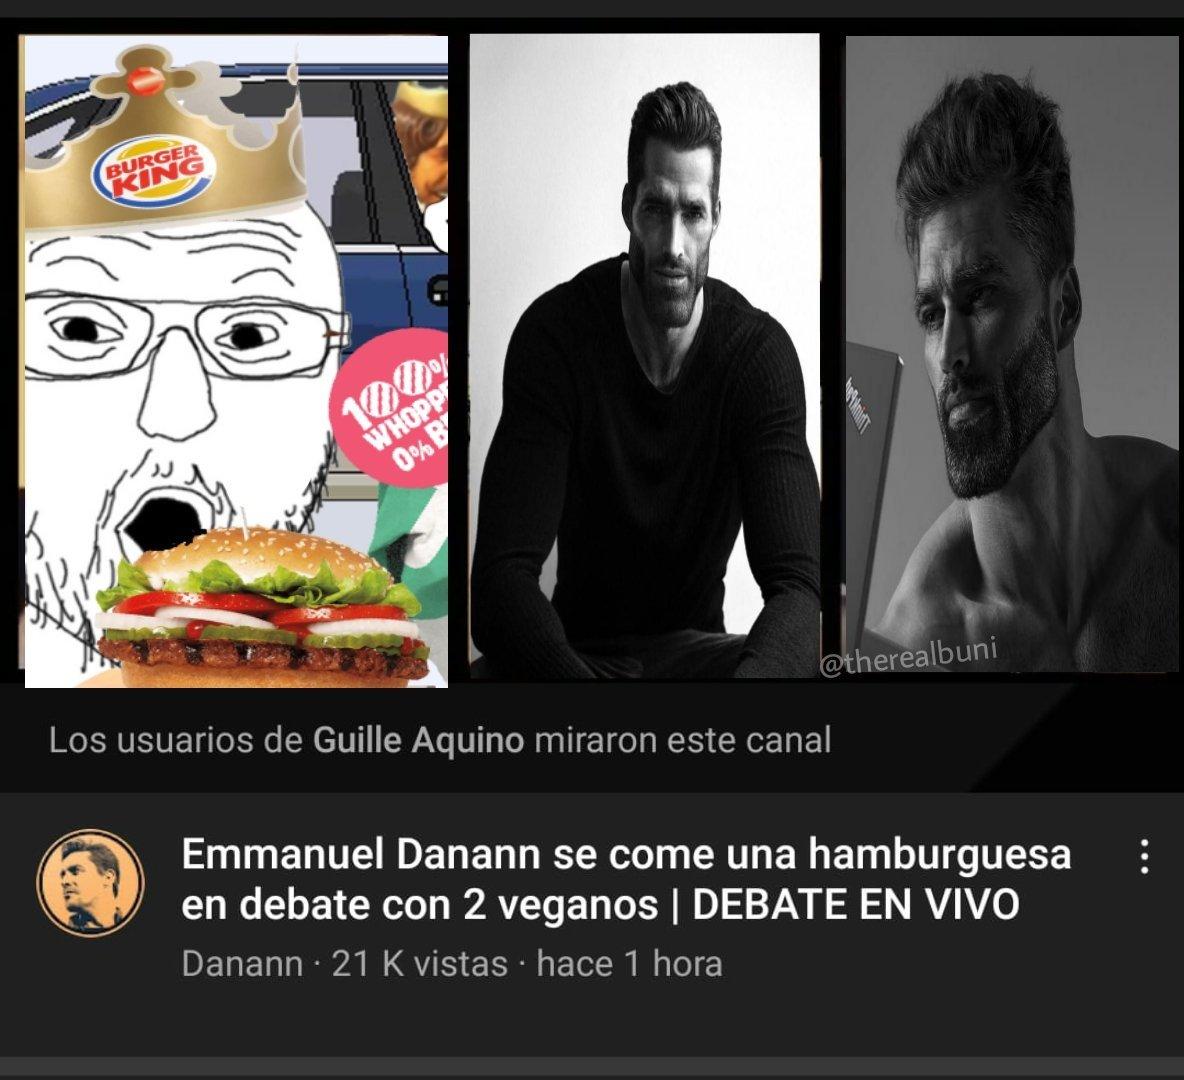 No man dannan comió hamburguesa en frente de dos vegano tremenda domada :soyjaka::soyjaka: - meme